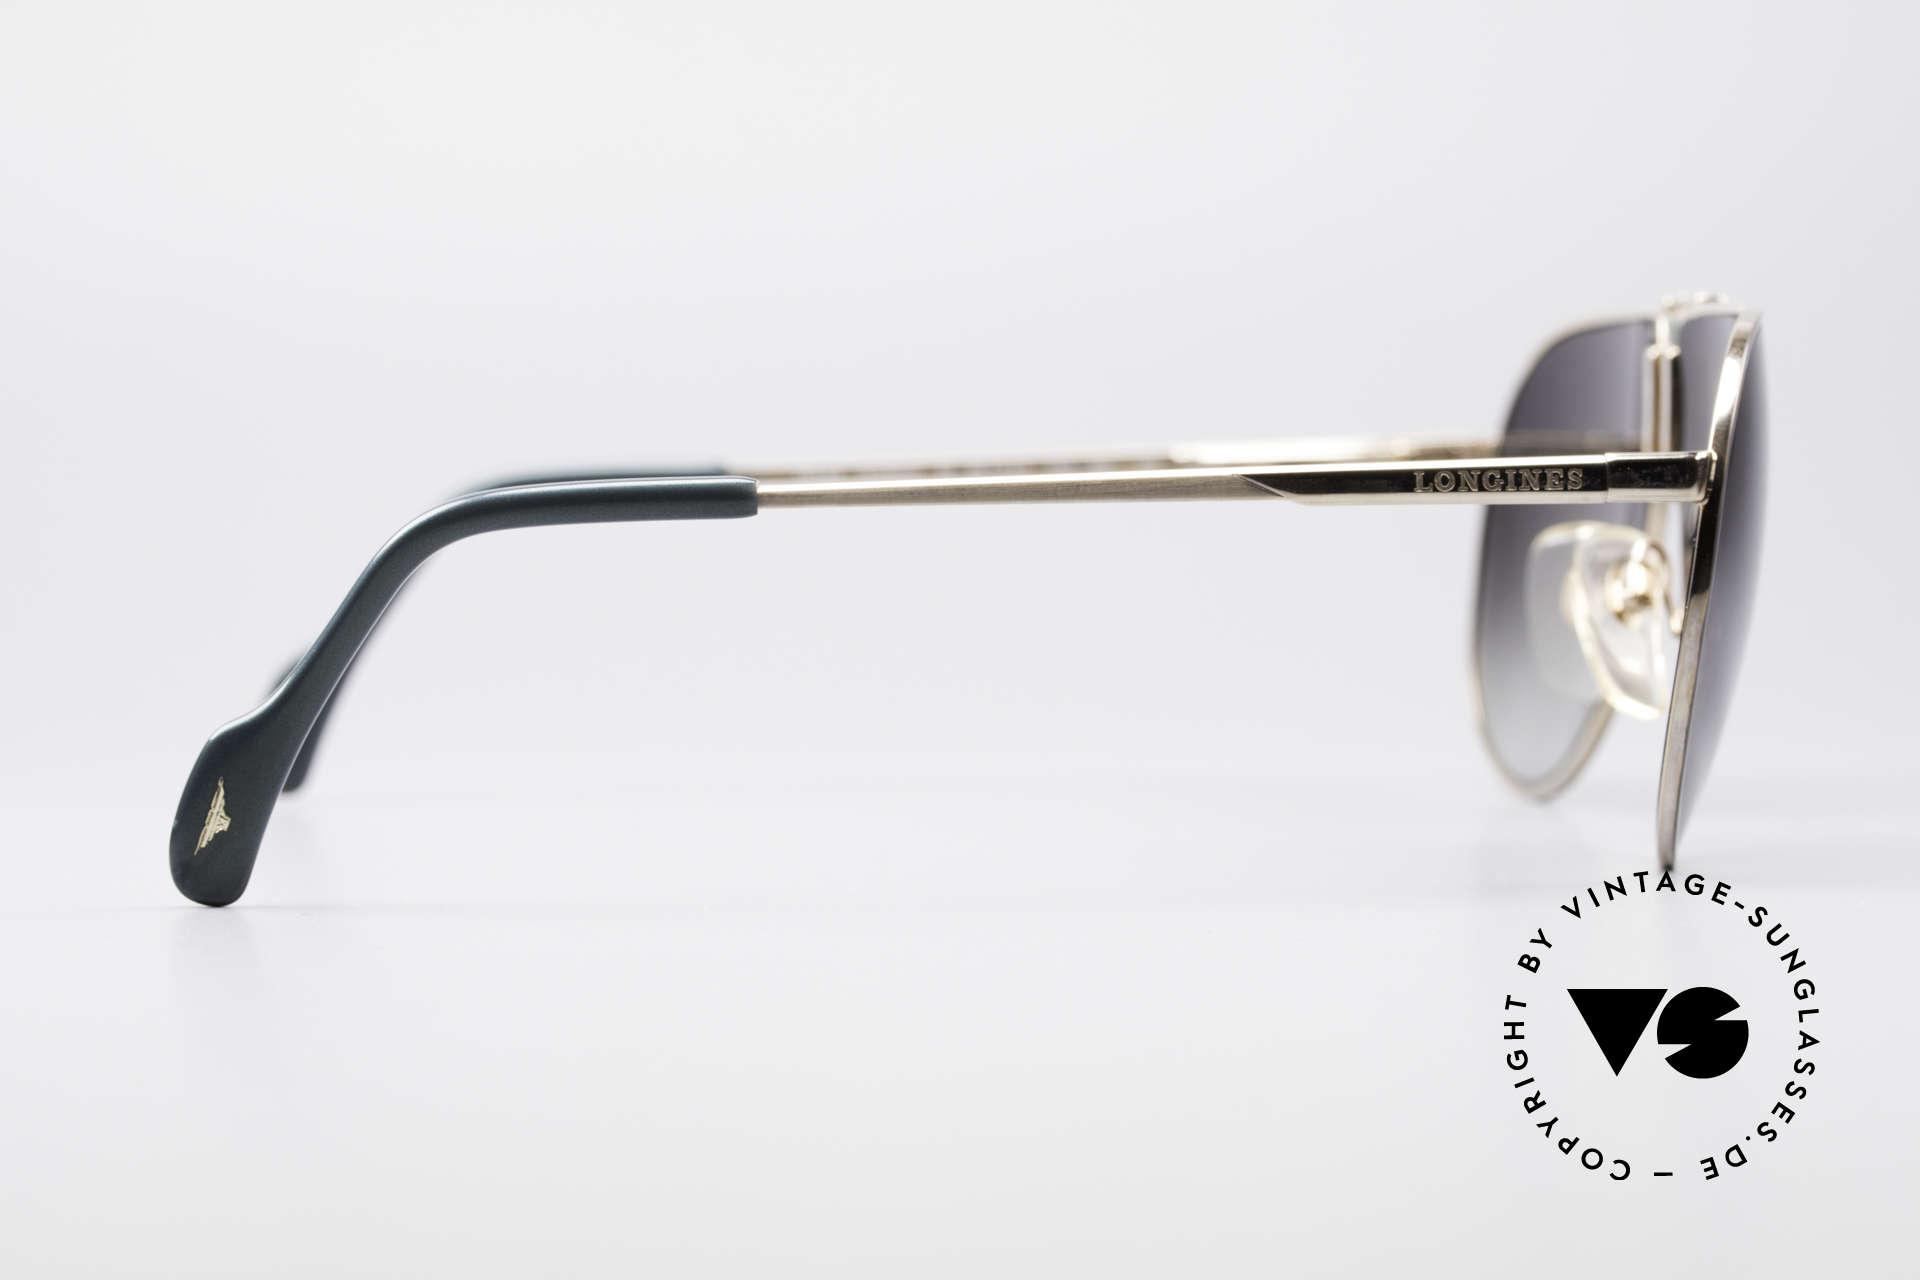 Longines 0154 1980's Aviator Sunglasses, never worn (like all our premium vintage sunglasses), Made for Men